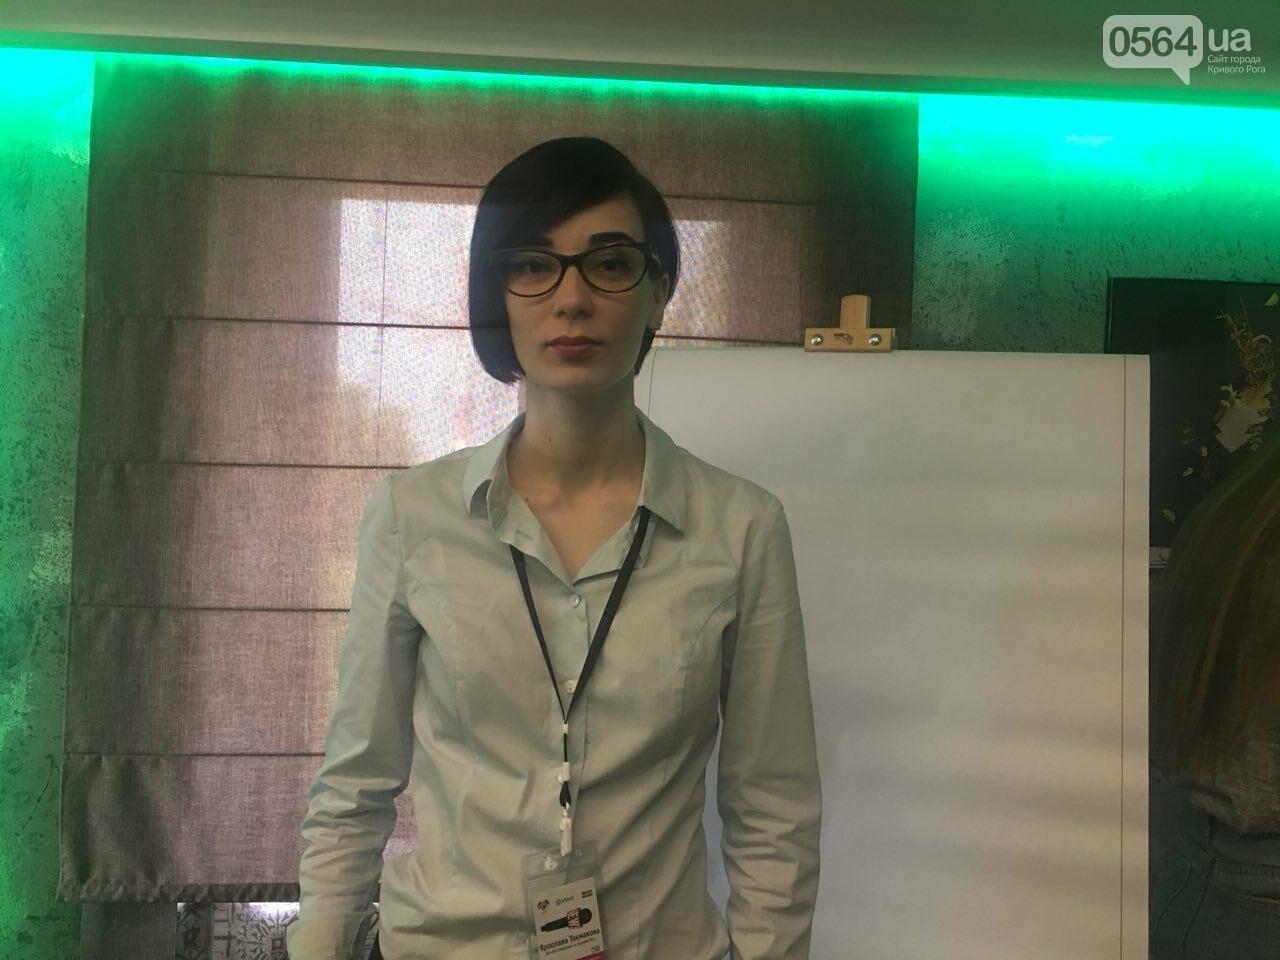 На тренинге о ВИЧ и медреформе криворожским журналистам рассказали о дискриминации и стереотипах, - ФОТО , фото-3